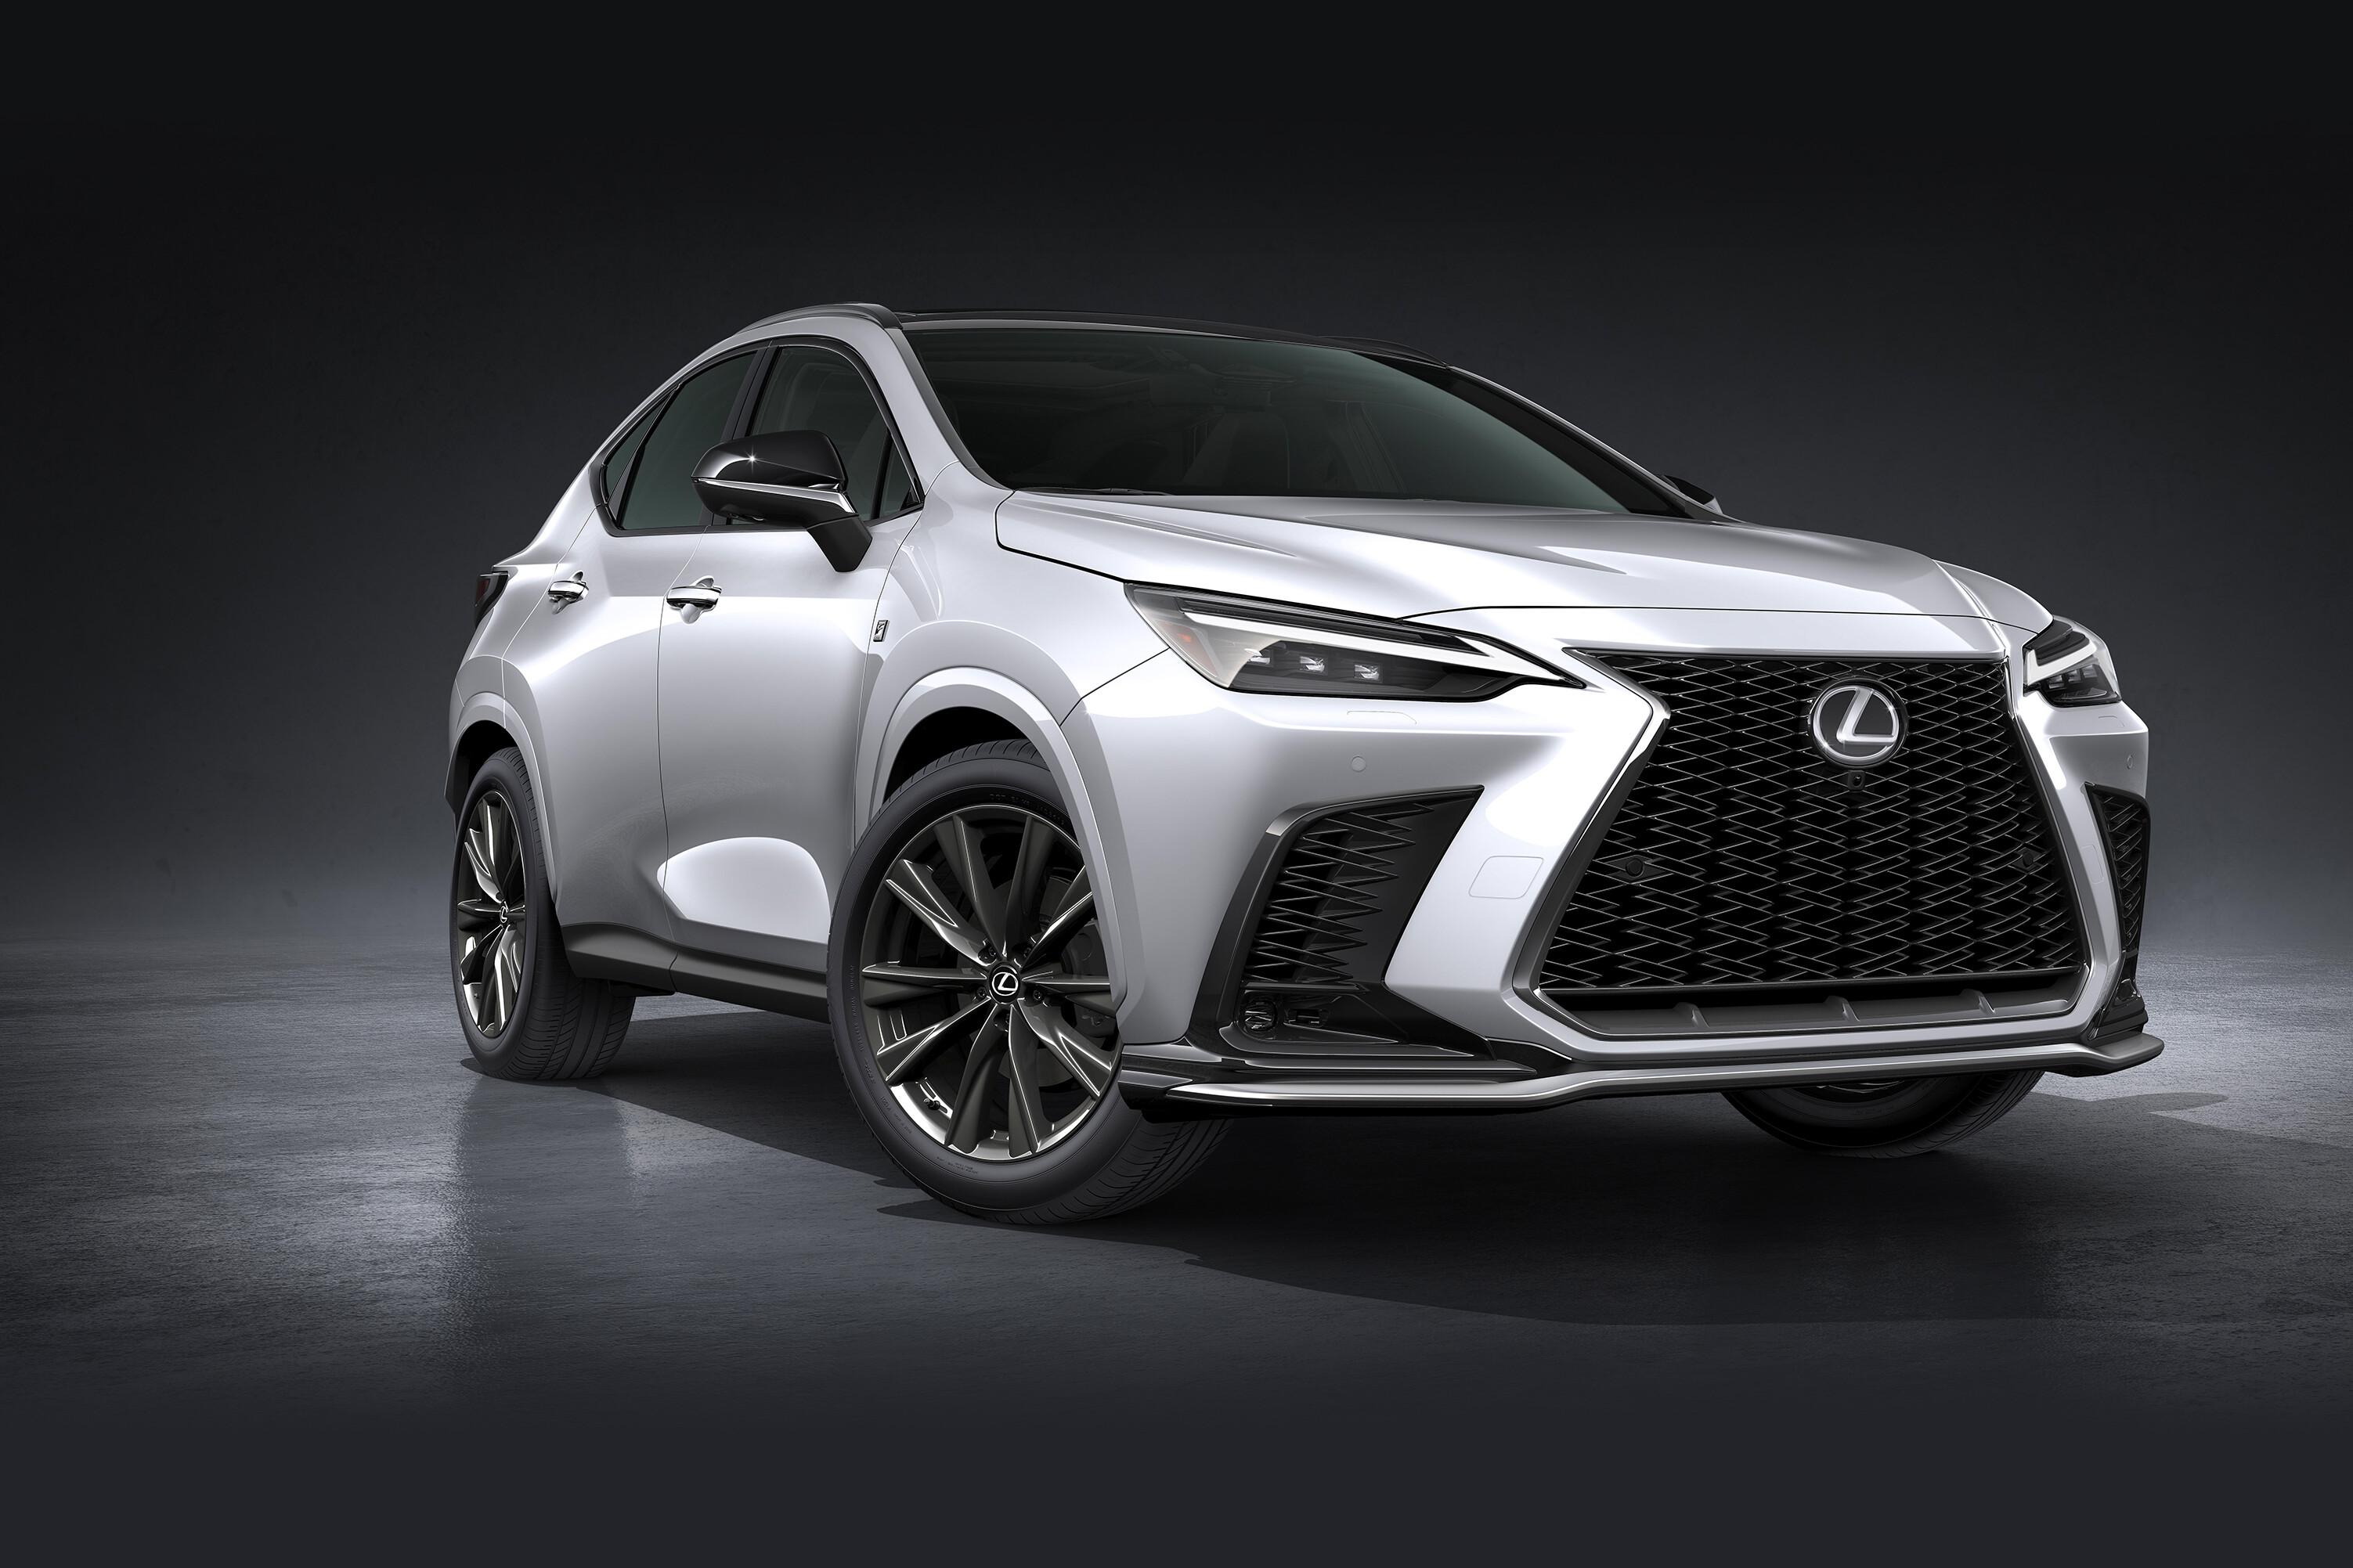 2022 Lexus NX SUV reveal